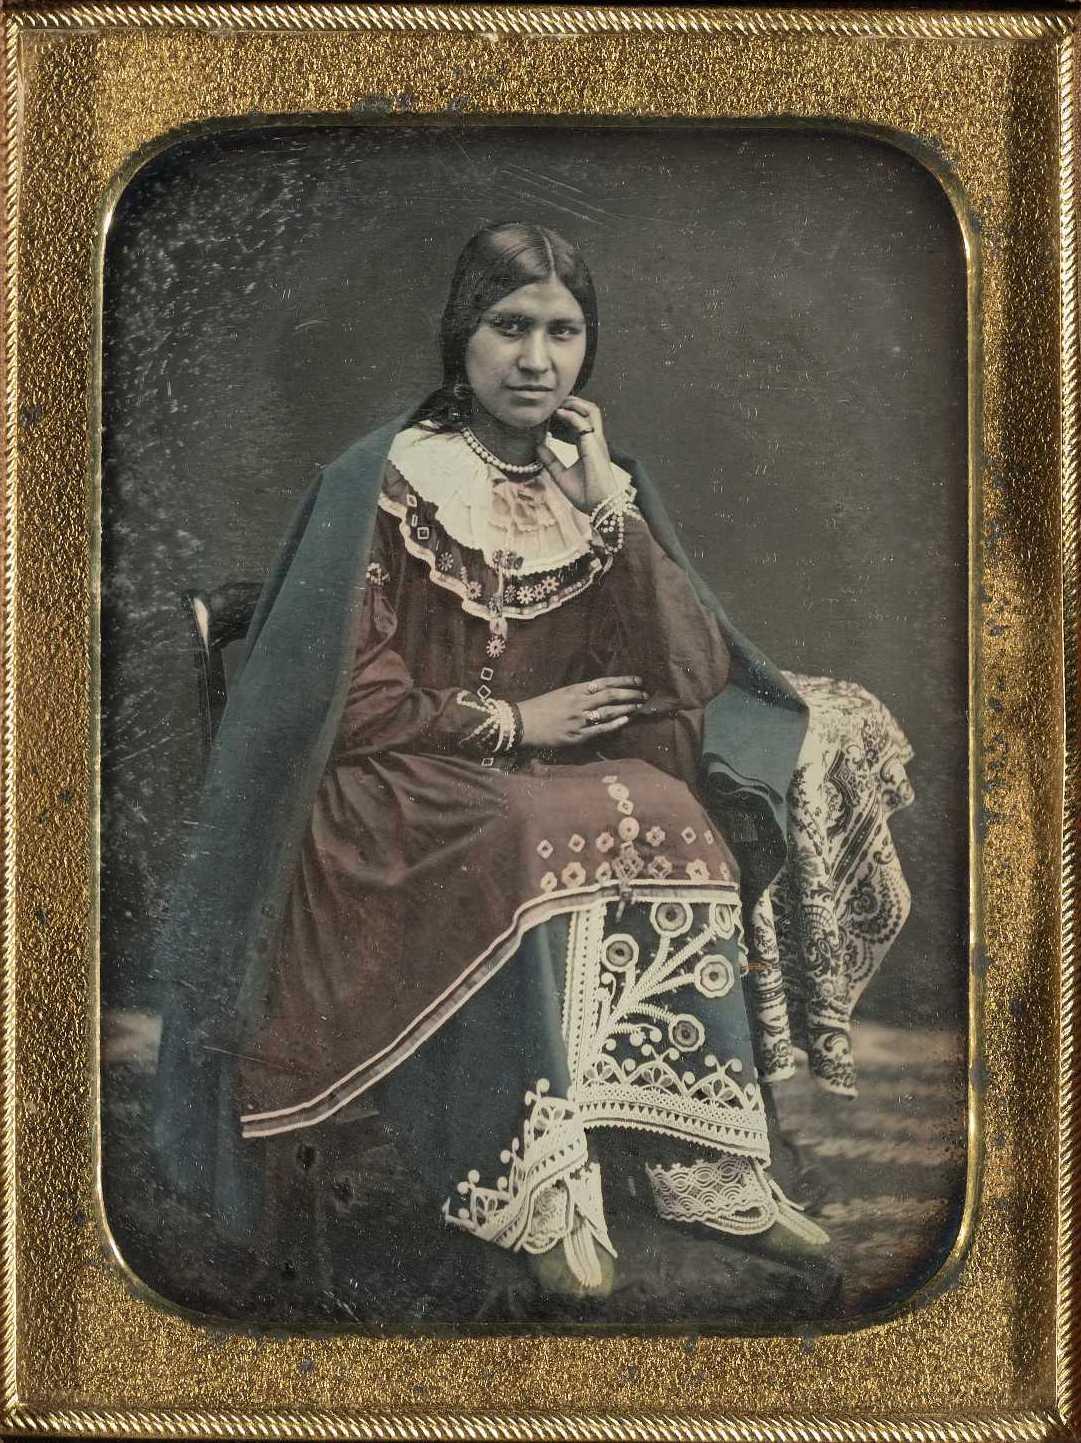 seneca women Seneca indian tribes had matriarchal set up of families seneca indian tribe women were in charge of farming,.